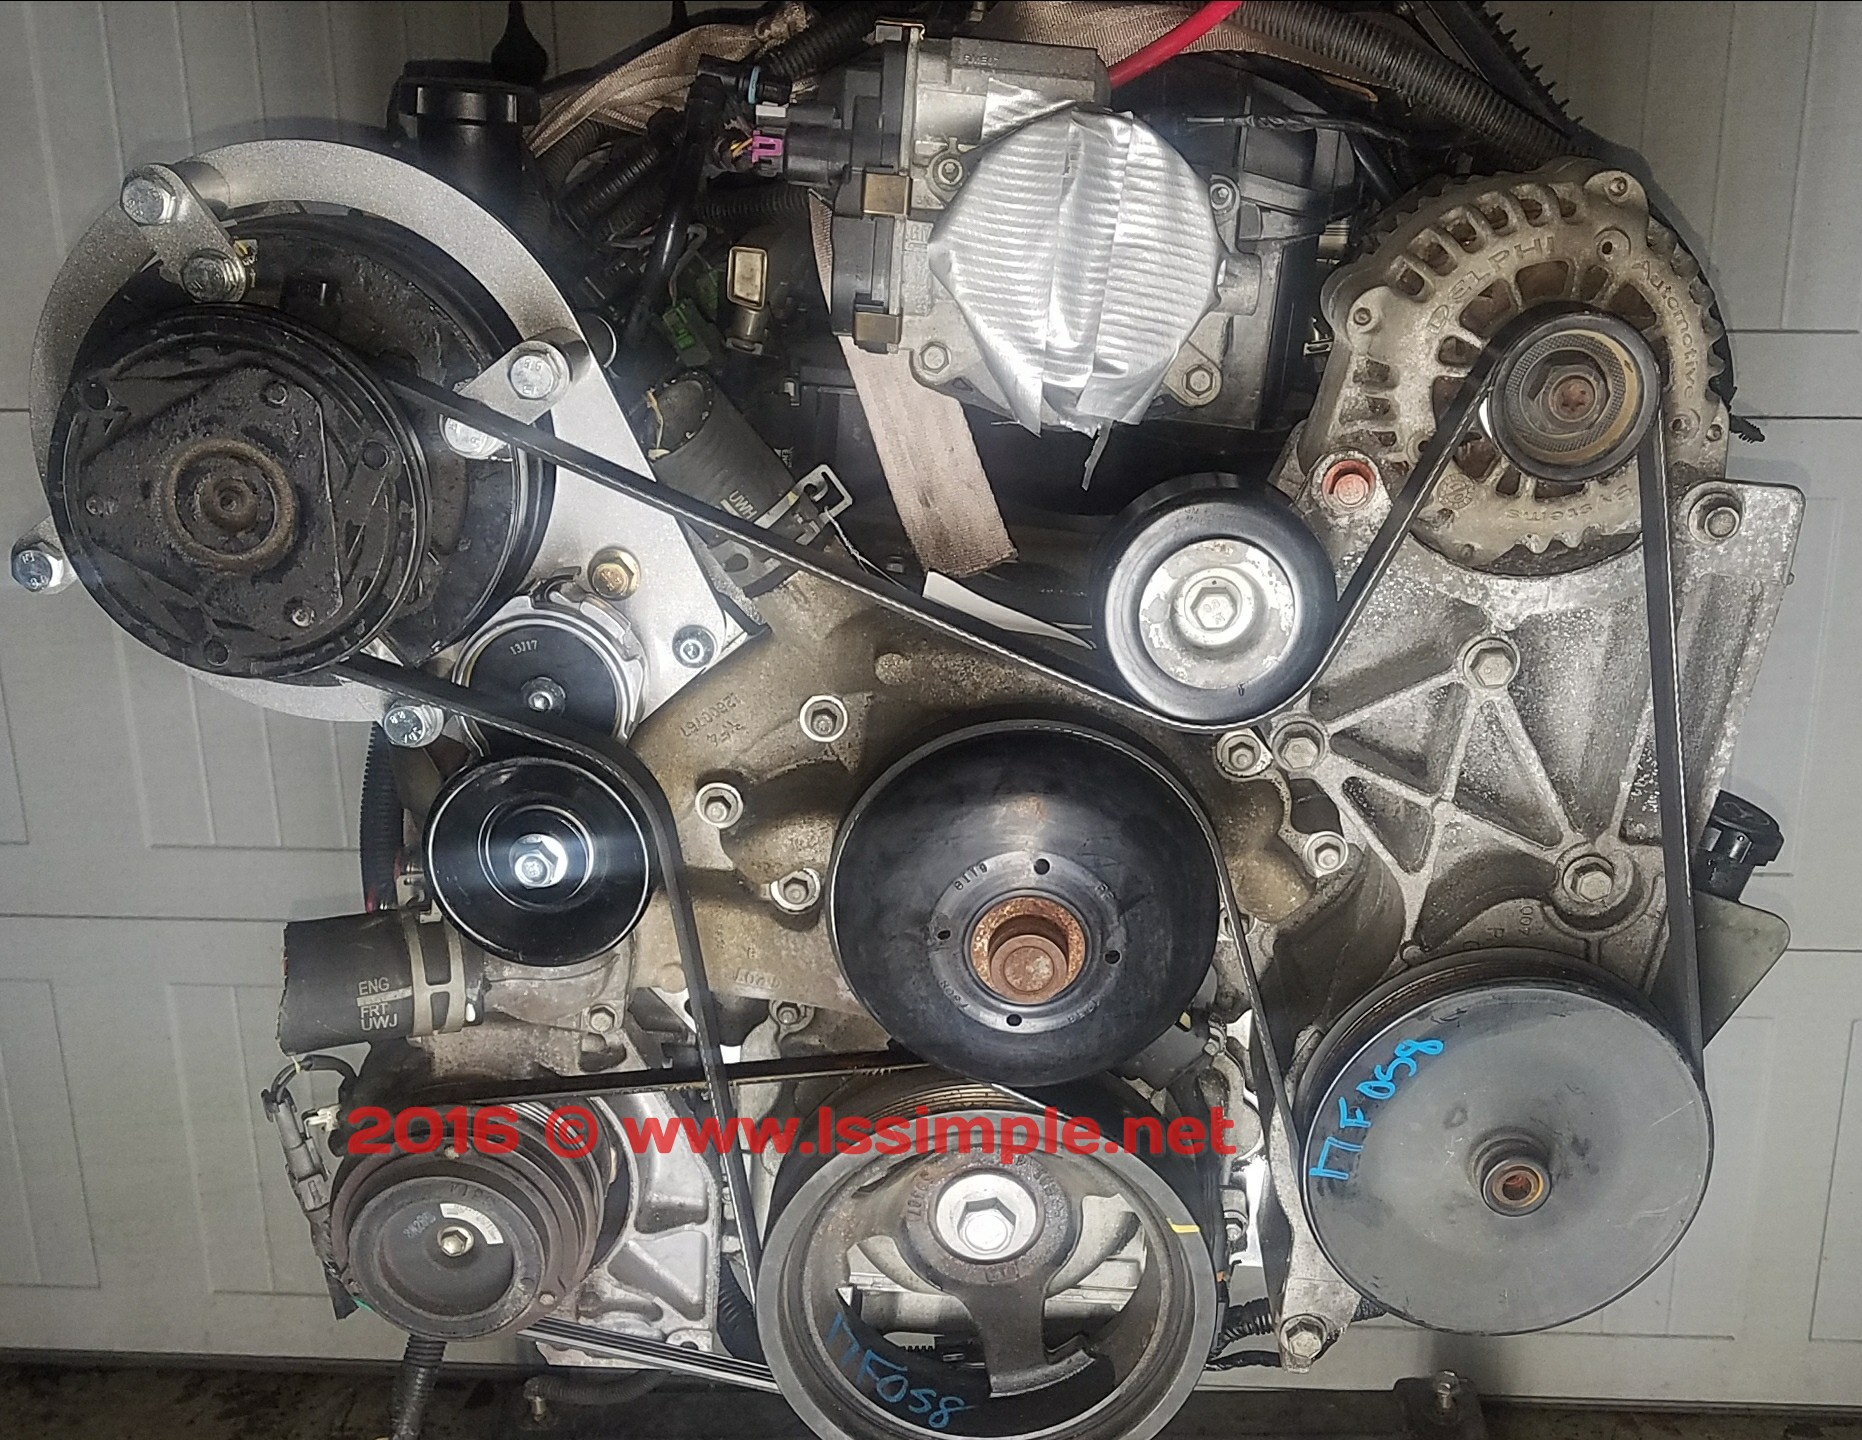 R-4 a/c stand alone bracket kit no compressor with belt free shipping U S   TS